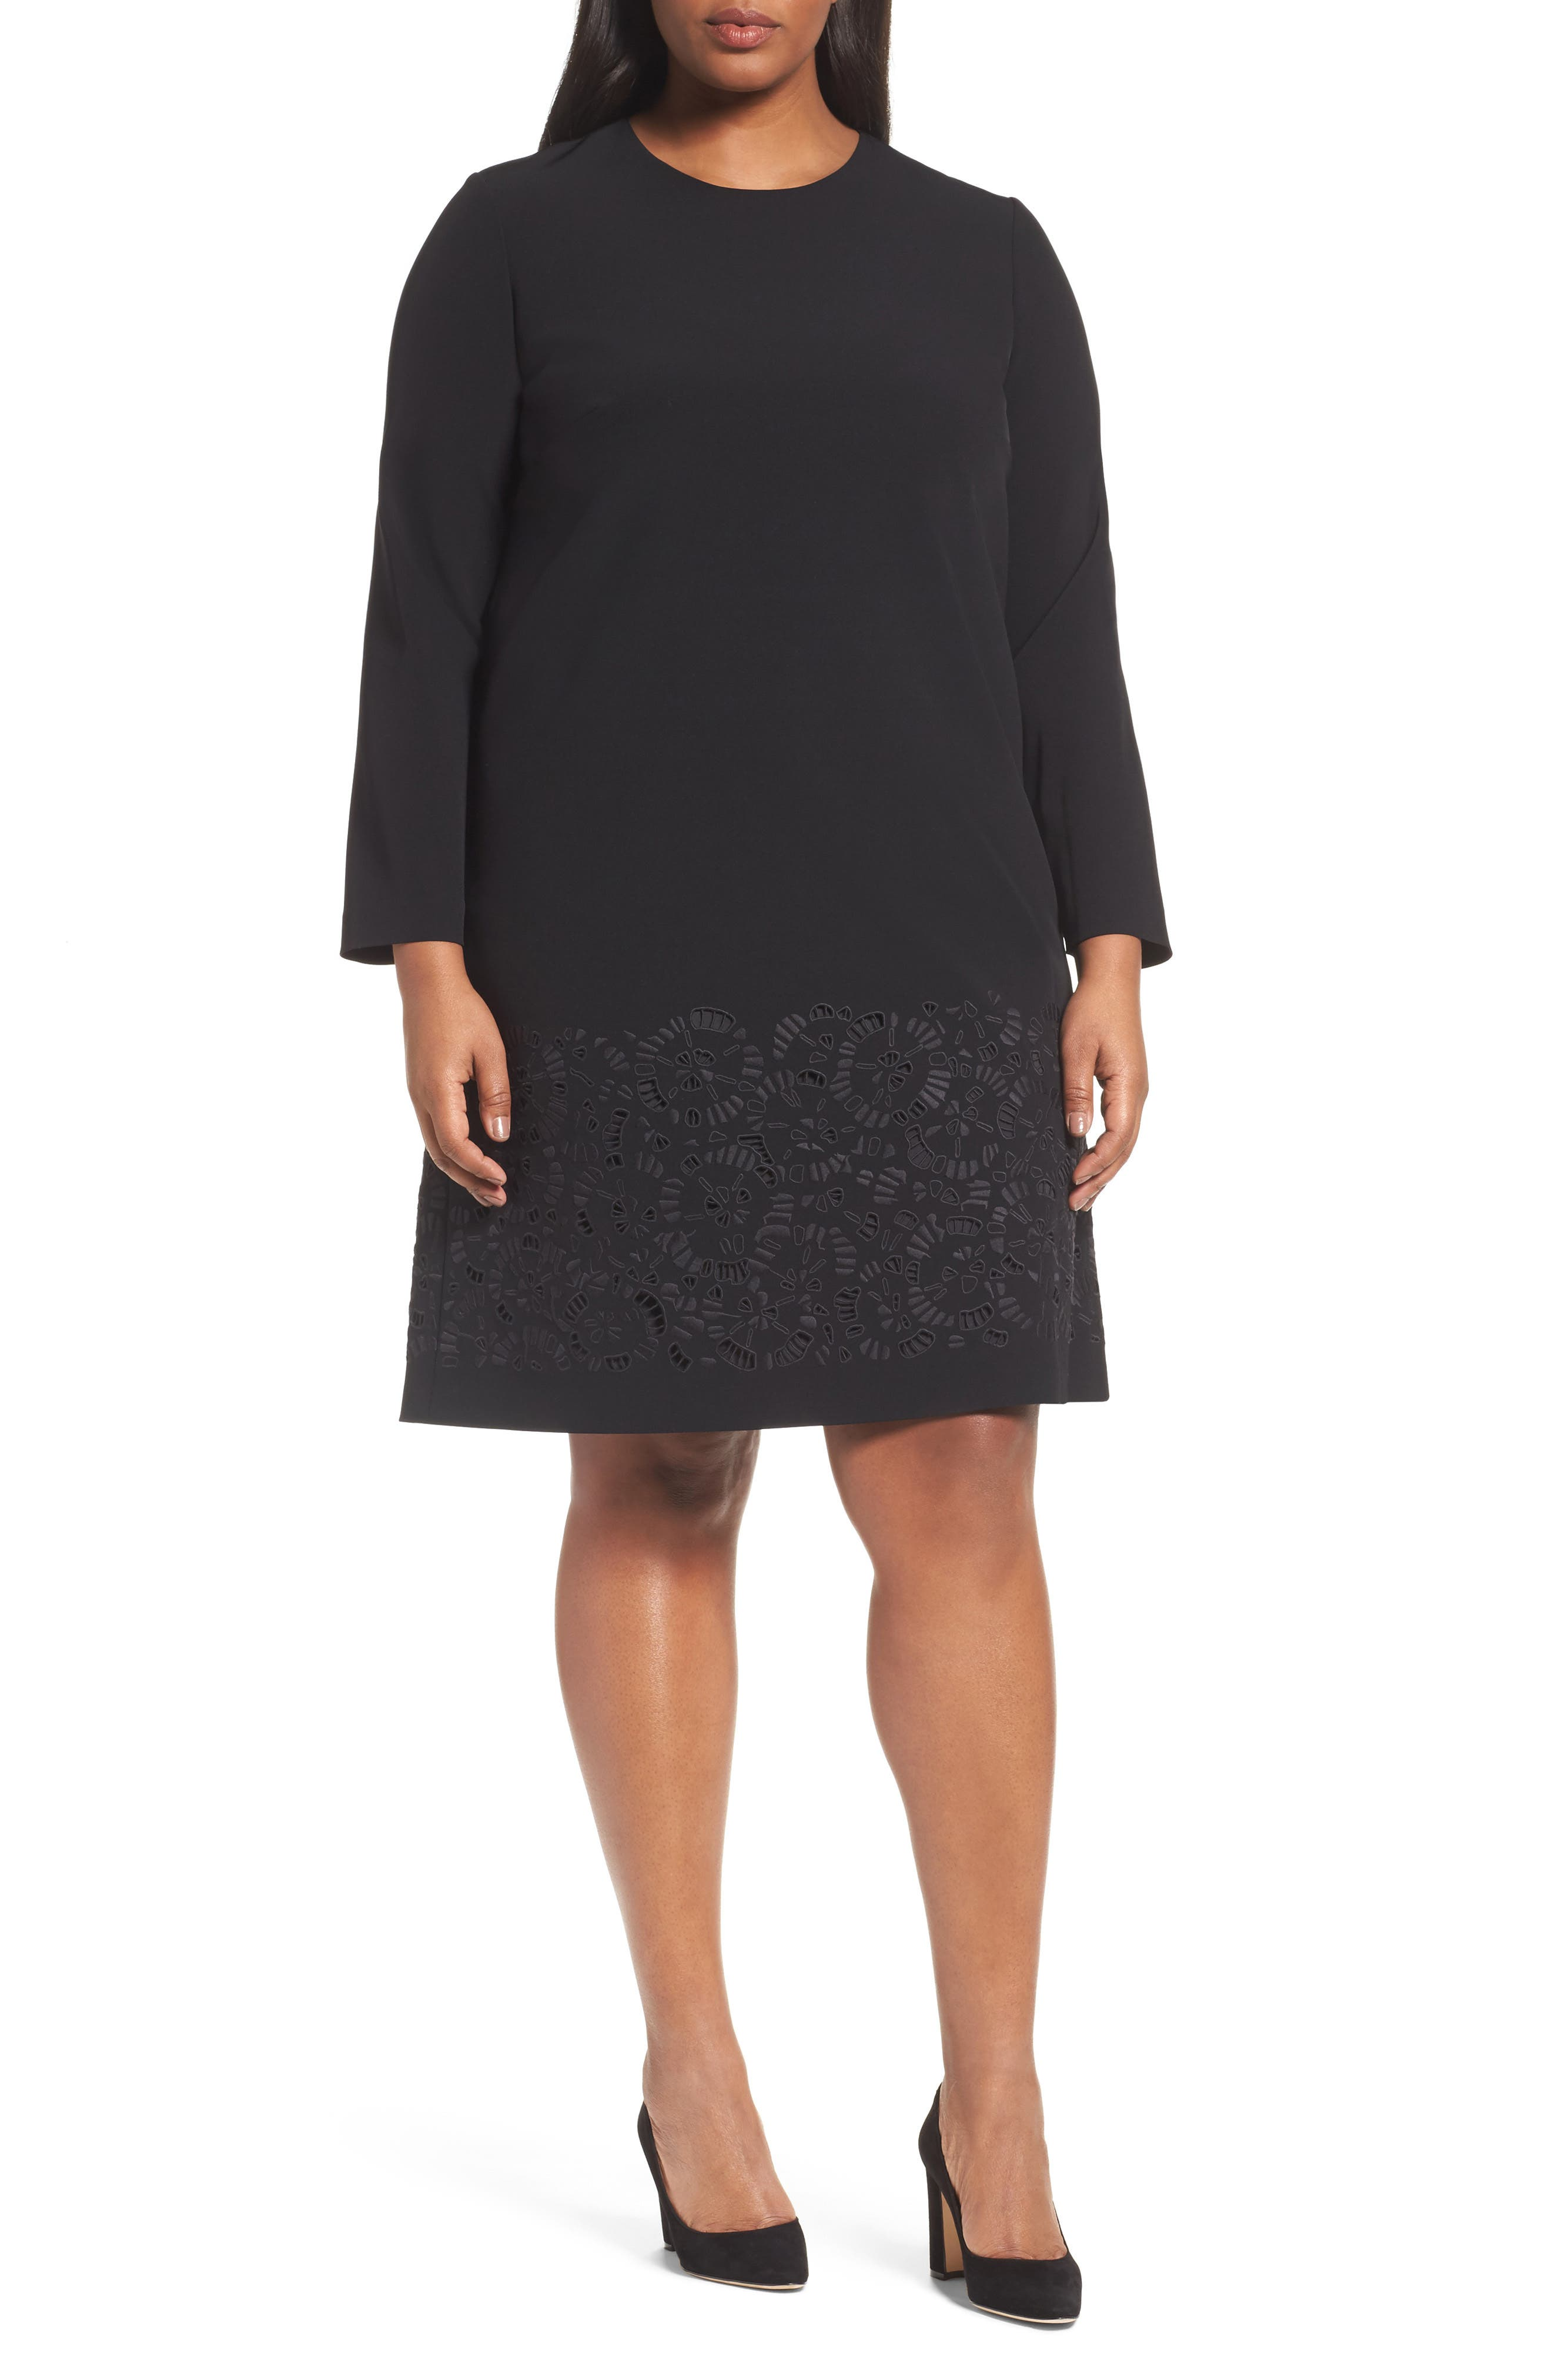 Corbin Laser Cut Dress,                             Main thumbnail 1, color,                             Black